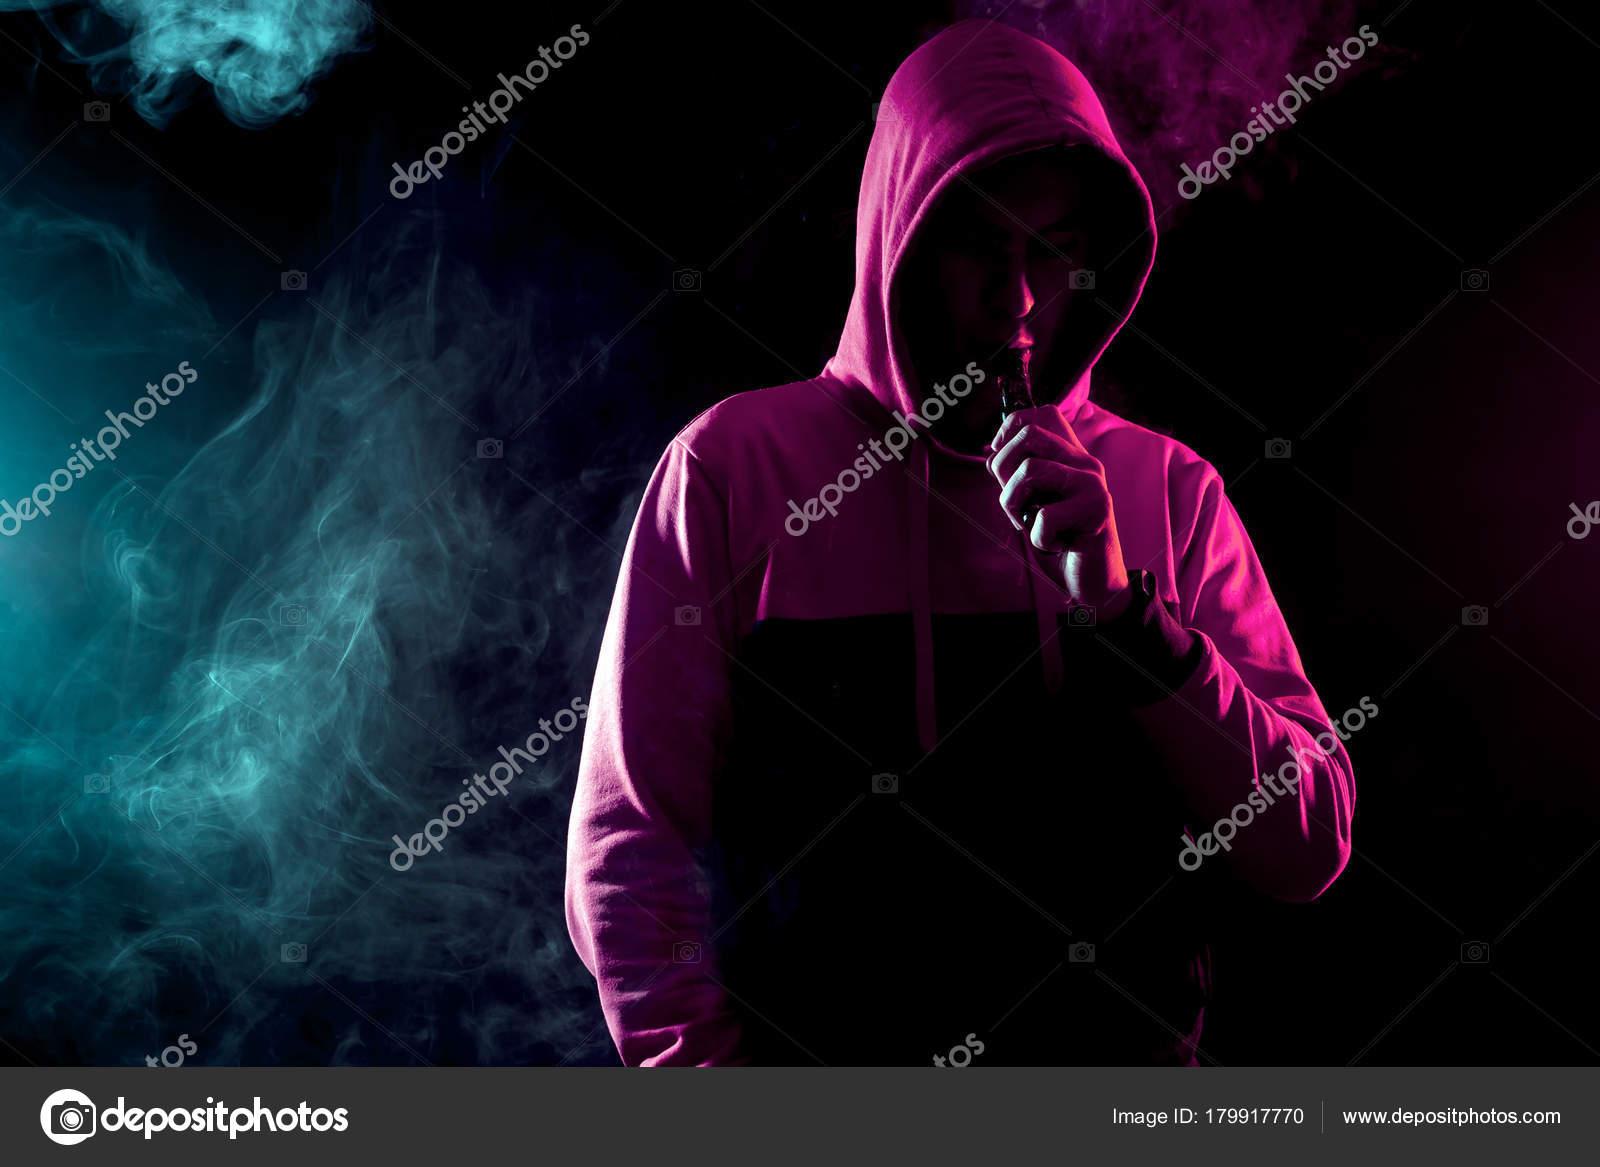 Man Smoke Vape Bright Light Background Green Pink Clouds